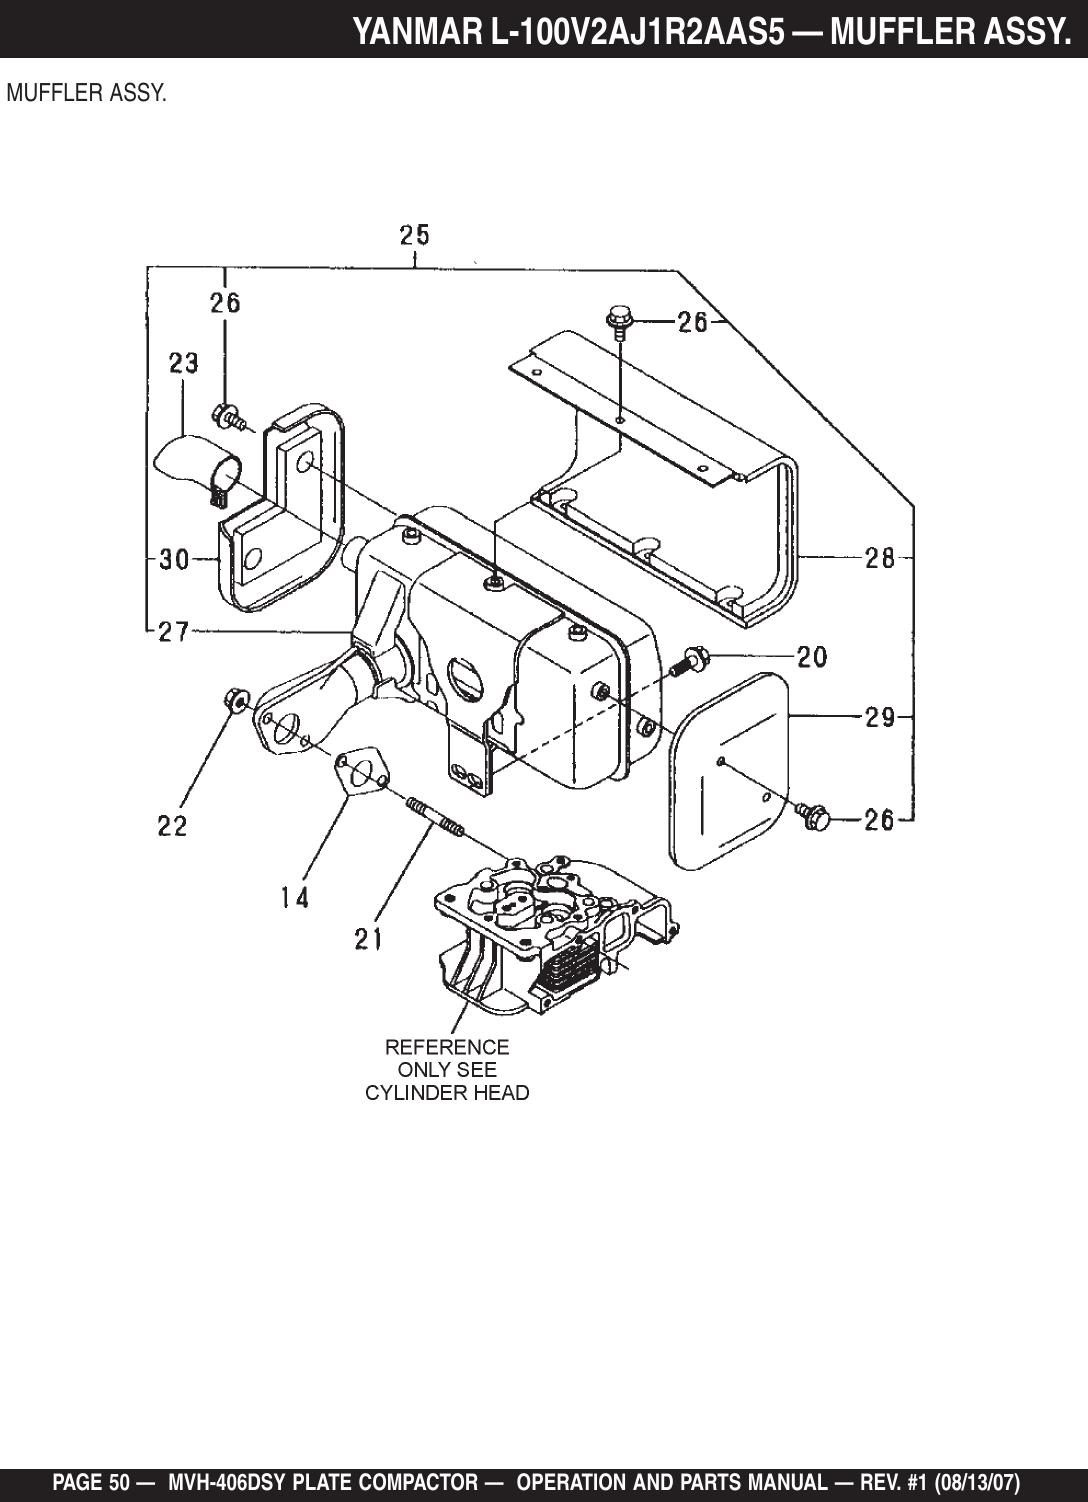 Multiquip Trash Compactor Mvh 406Dsy Users Manual rev 1 PMD